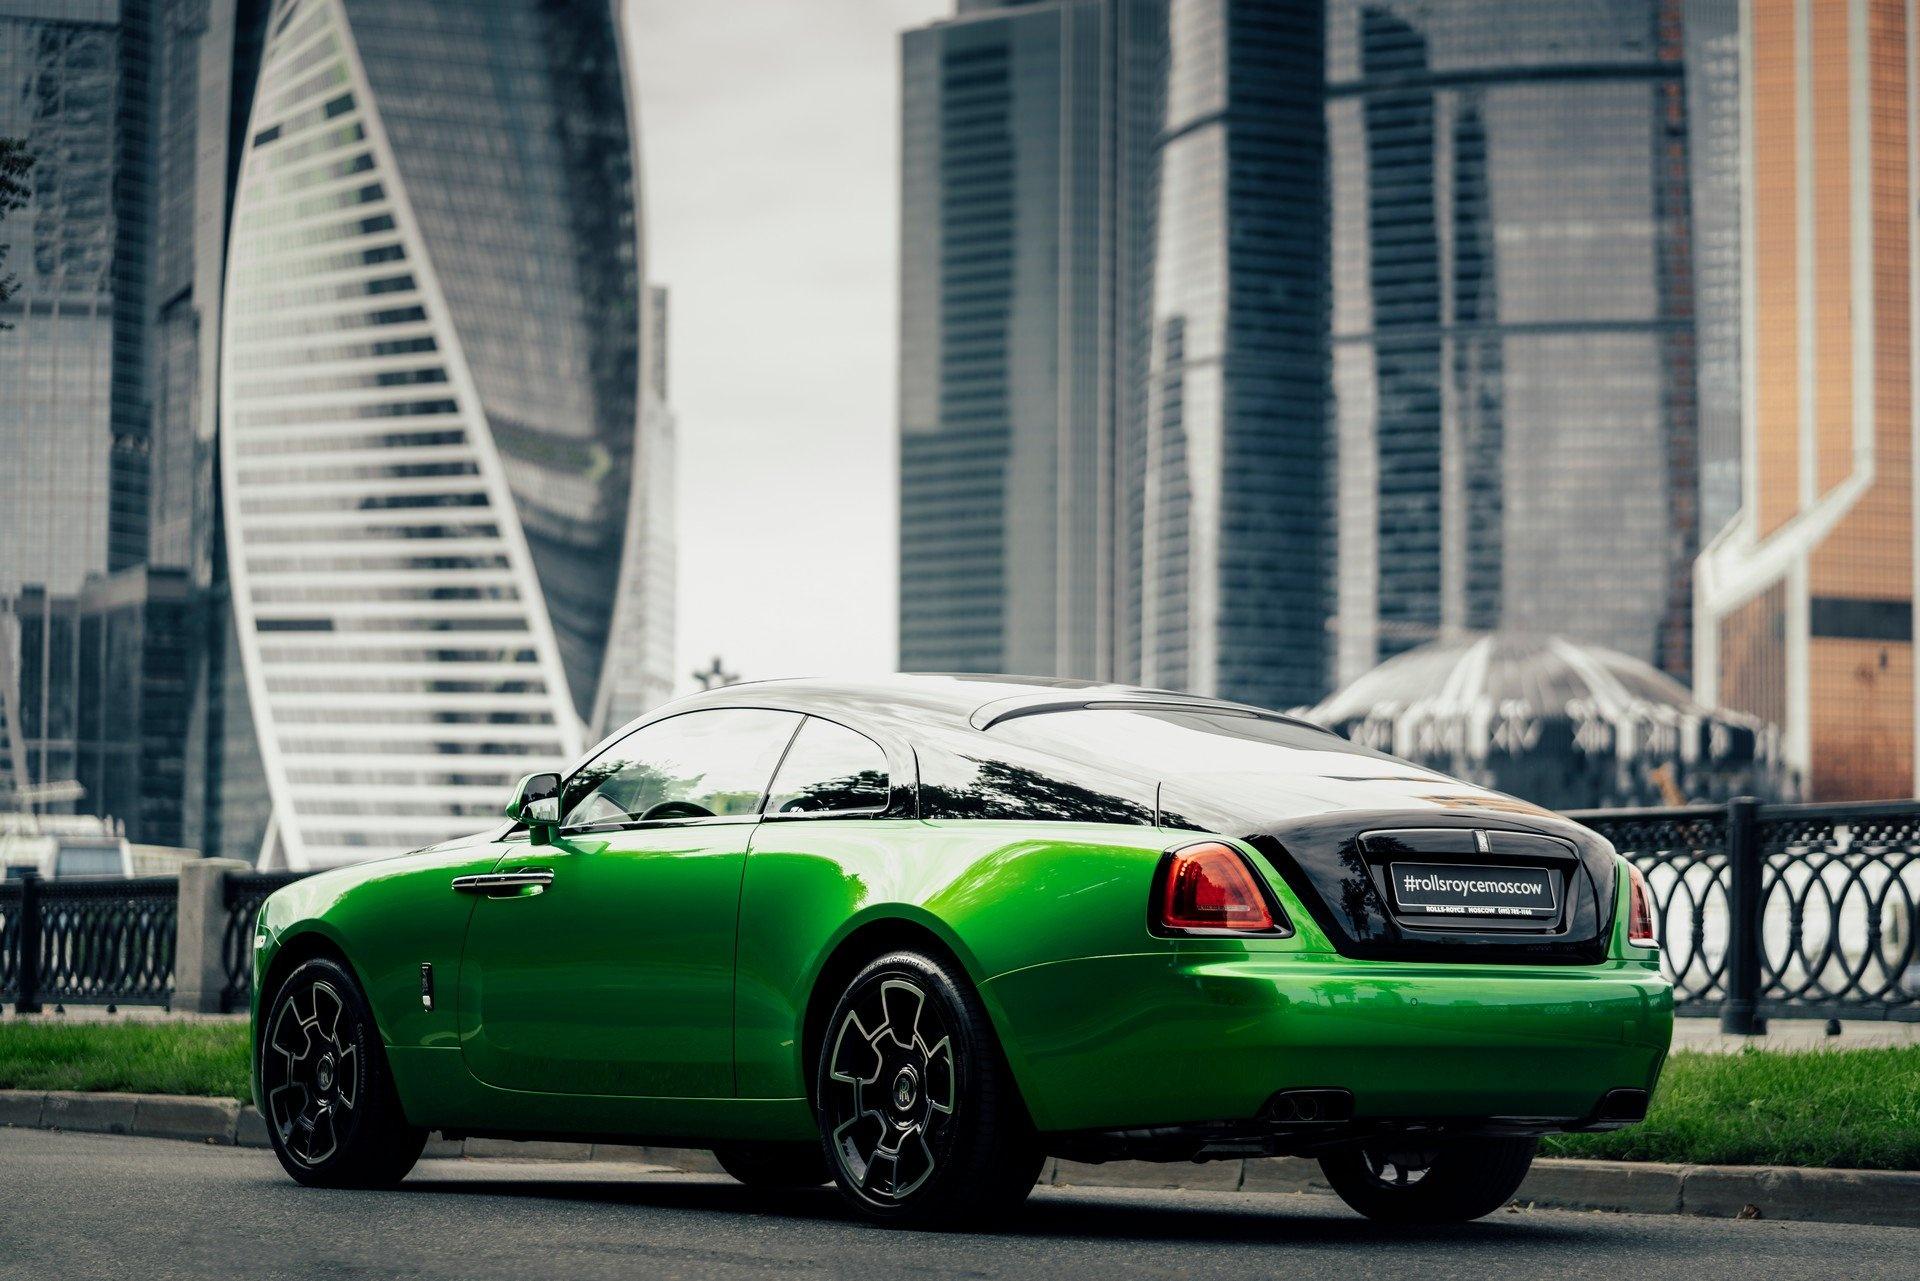 Ngam bo suu tap Rolls-Royce dac biet 'Dem Moscow' hinh anh 4